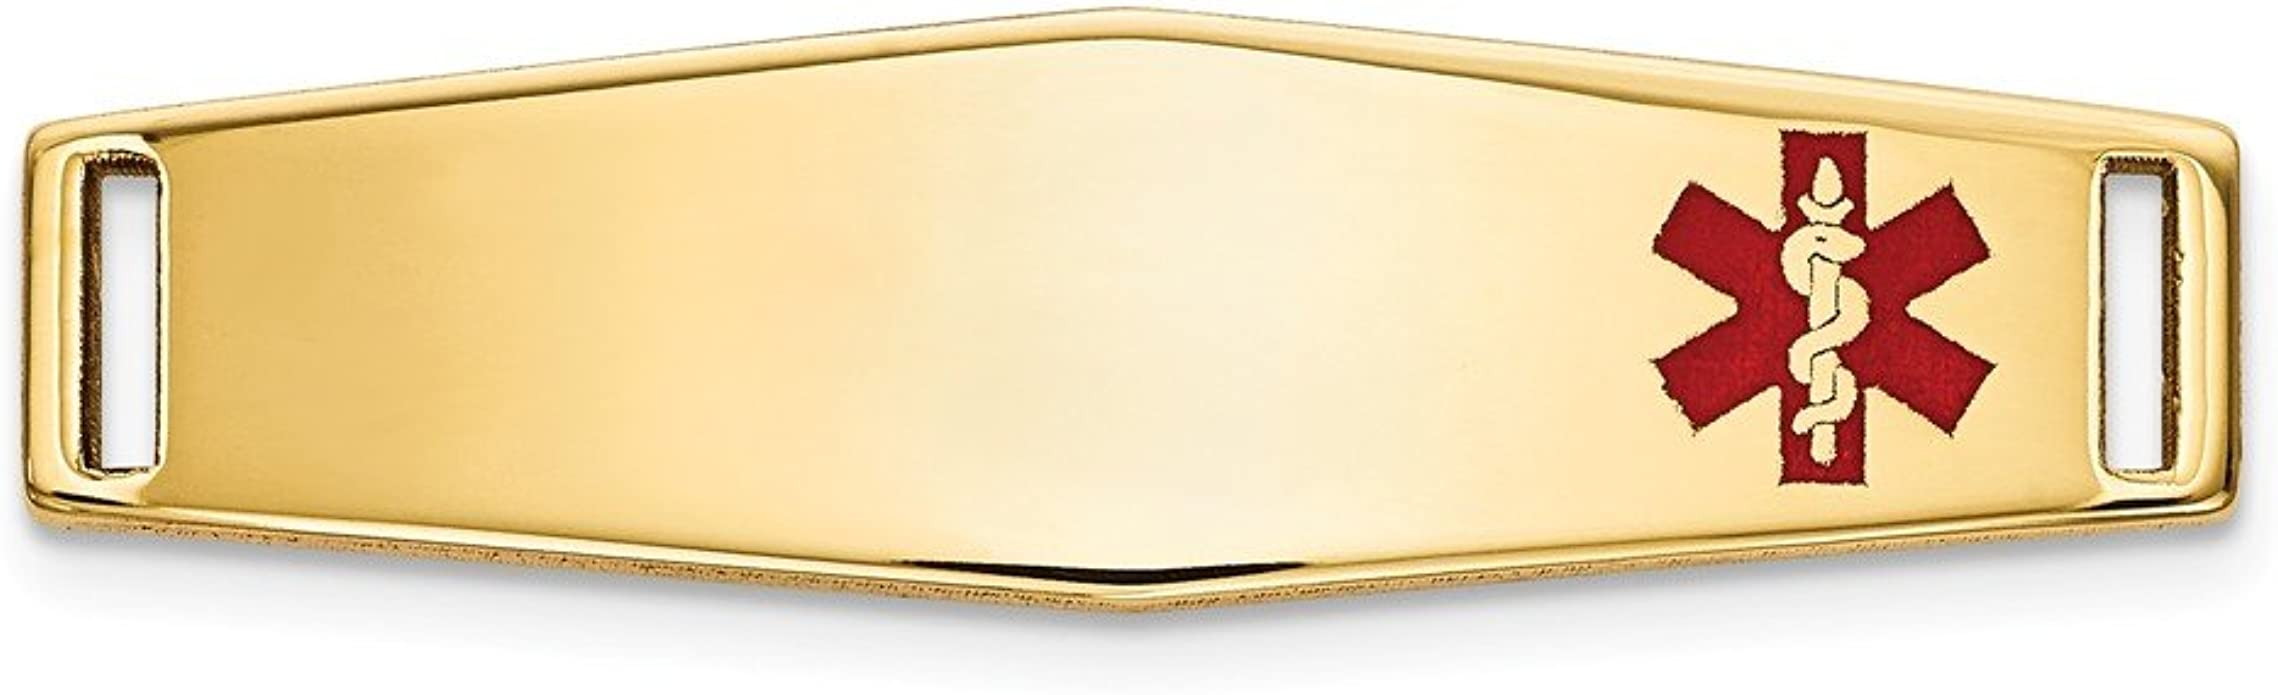 Mia Diamonds 14k Yellow Gold Heart-Shaped Polished Enameled Engravable Medical Jewelry Pendant